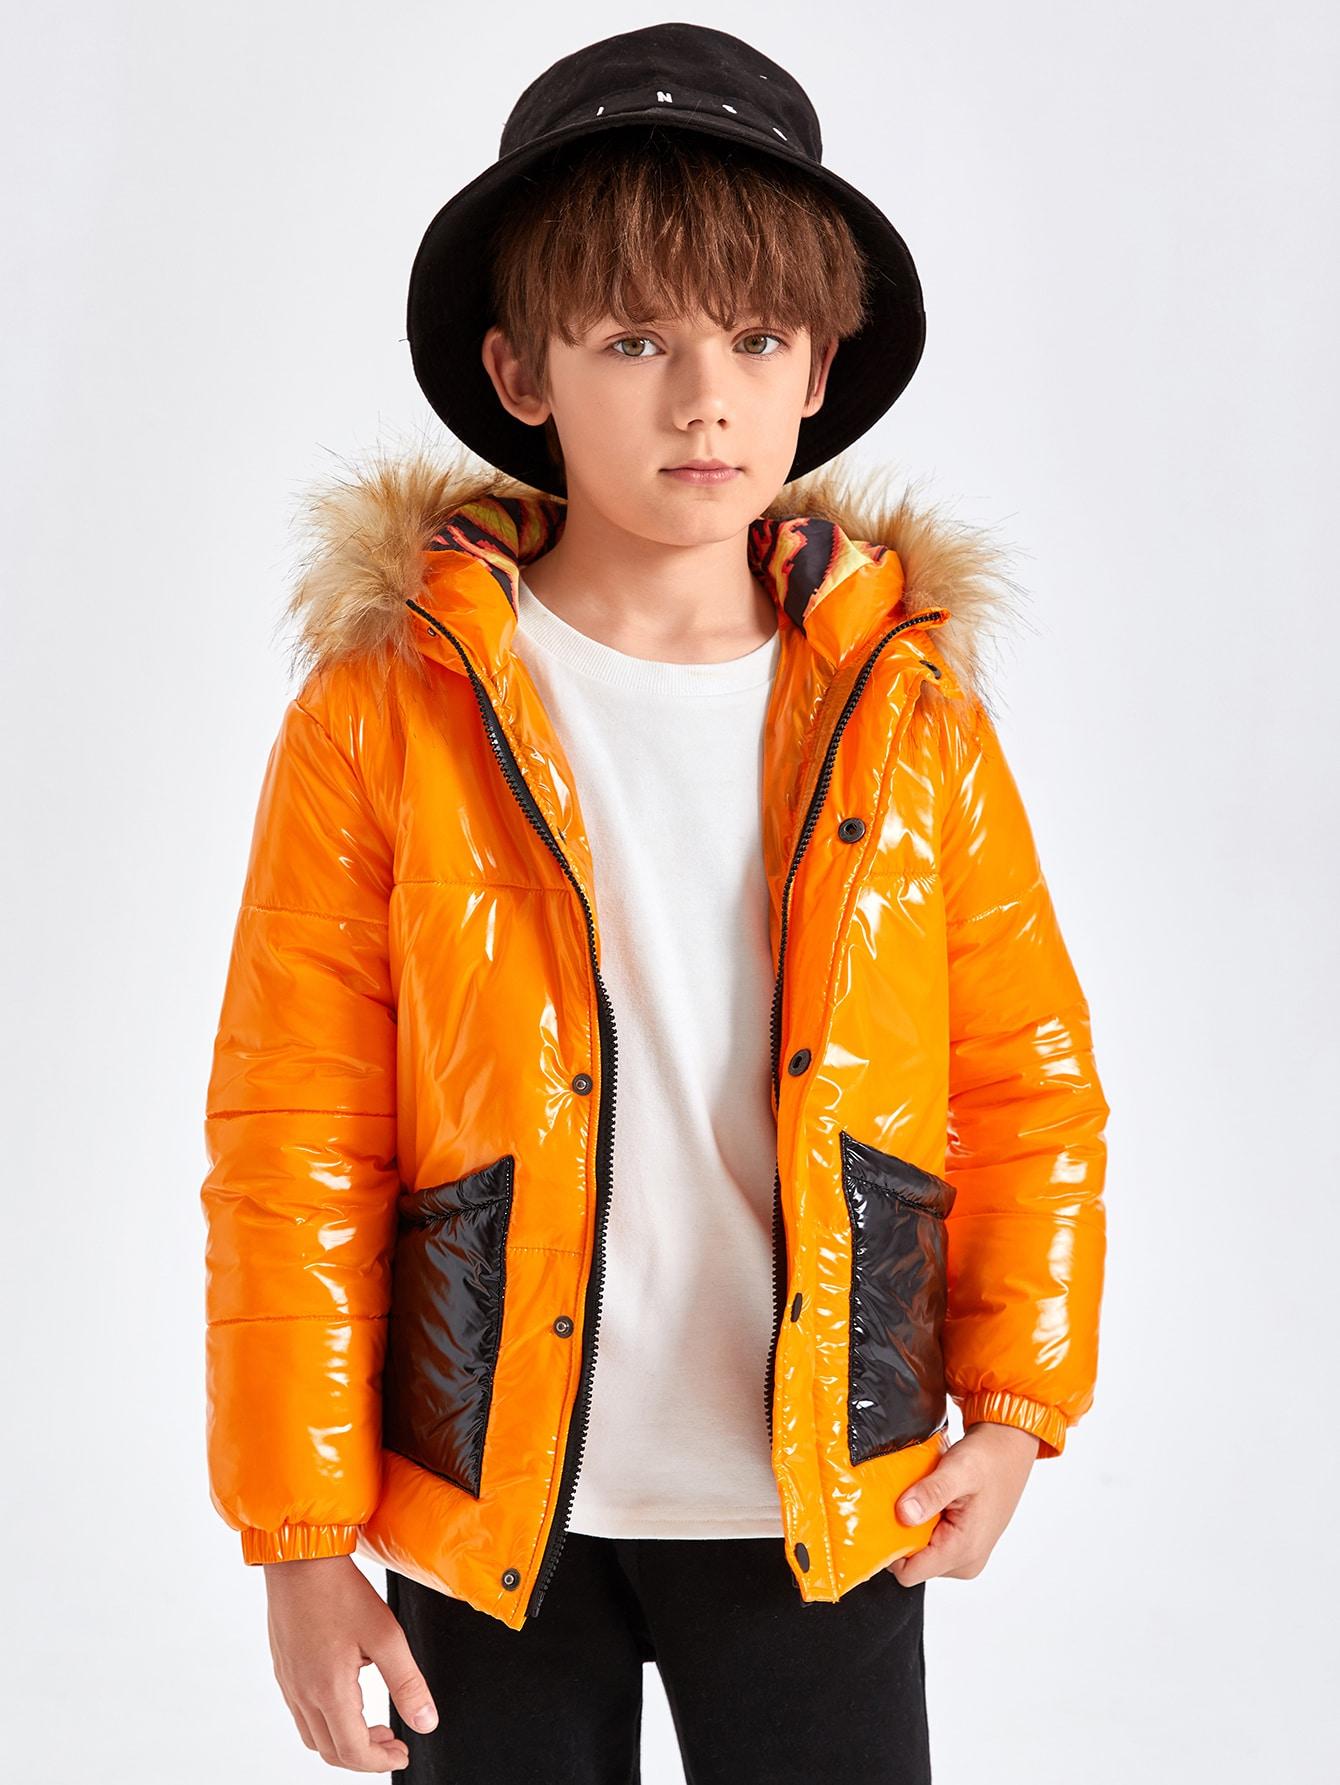 Boys Neon Orange Pu Leather Puffer Jacket